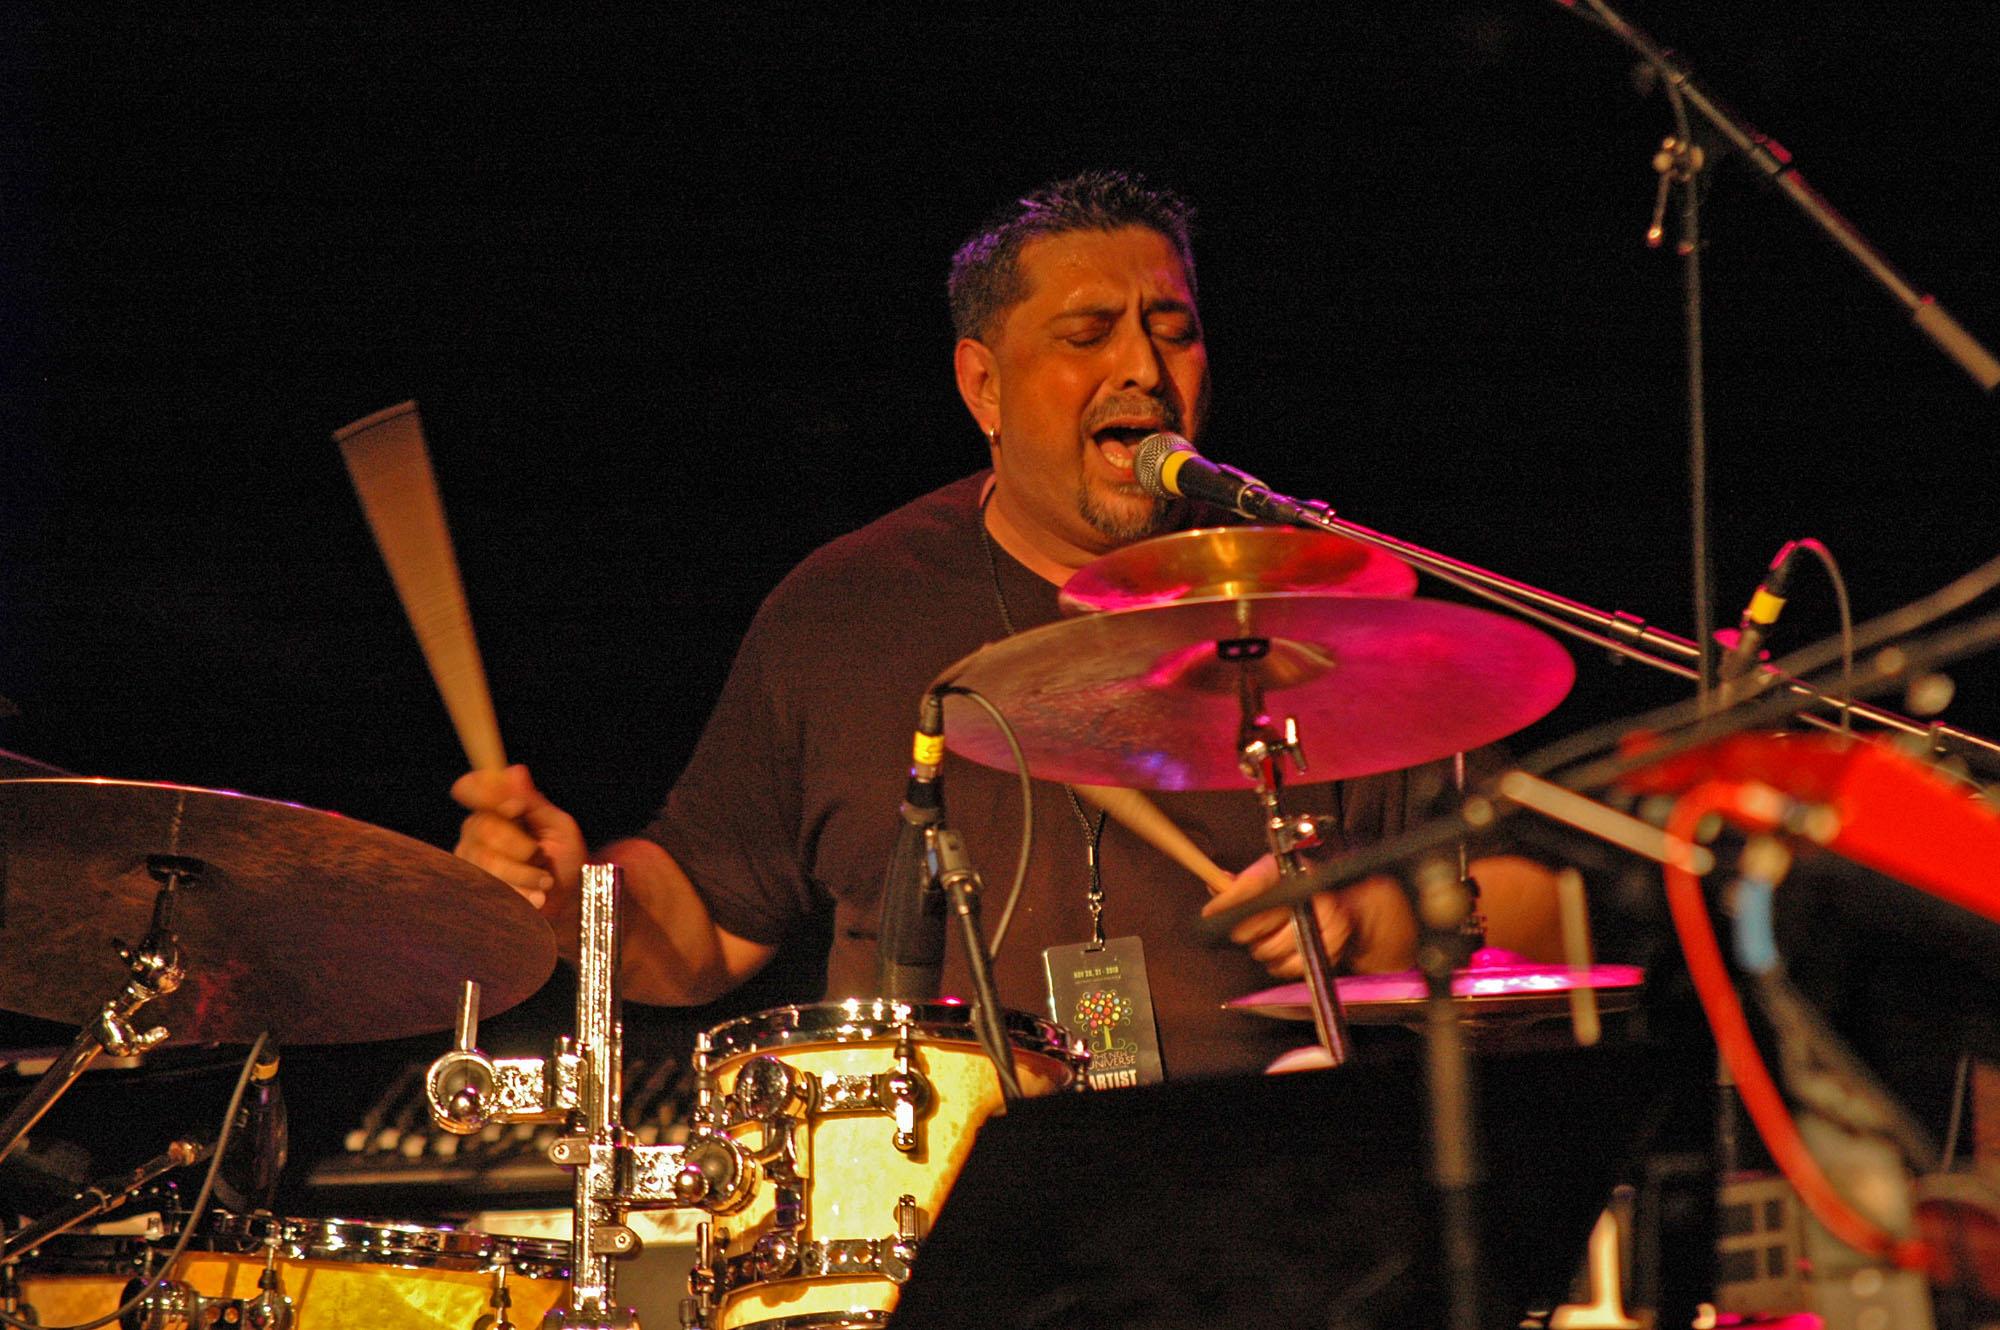 Ranjit Barot, Performing at the New Universe Music Festival 2010